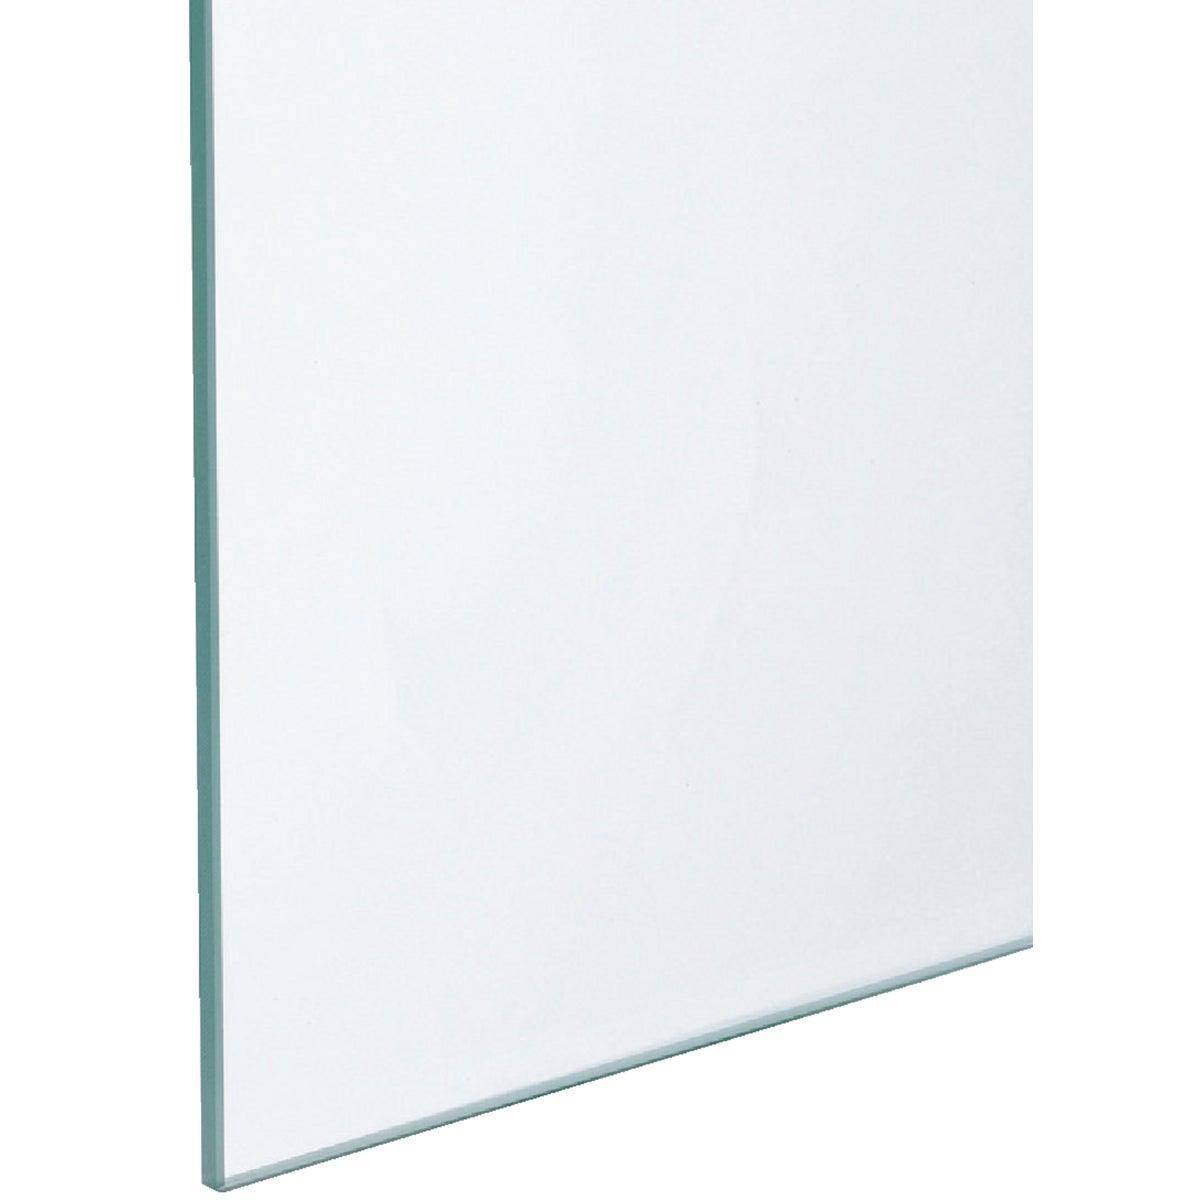 16X36SSB WINDOW GLASS 13 - 16X36 by Knight Industrs Corp